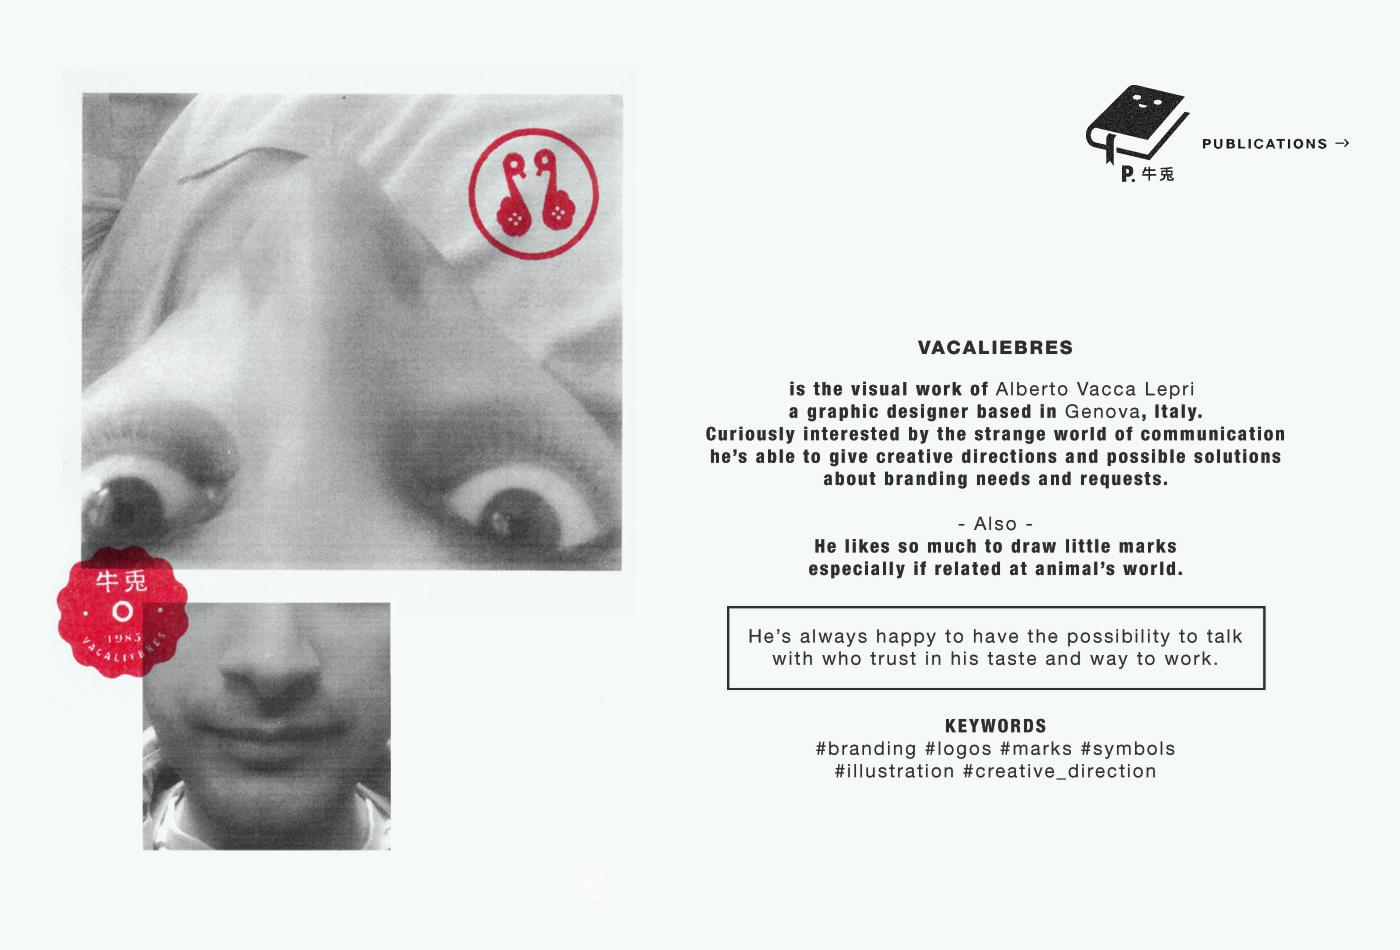 vacaliebres-albertovacca-alberto-vacca-lepri-vaccalepri-genova-logo-branding